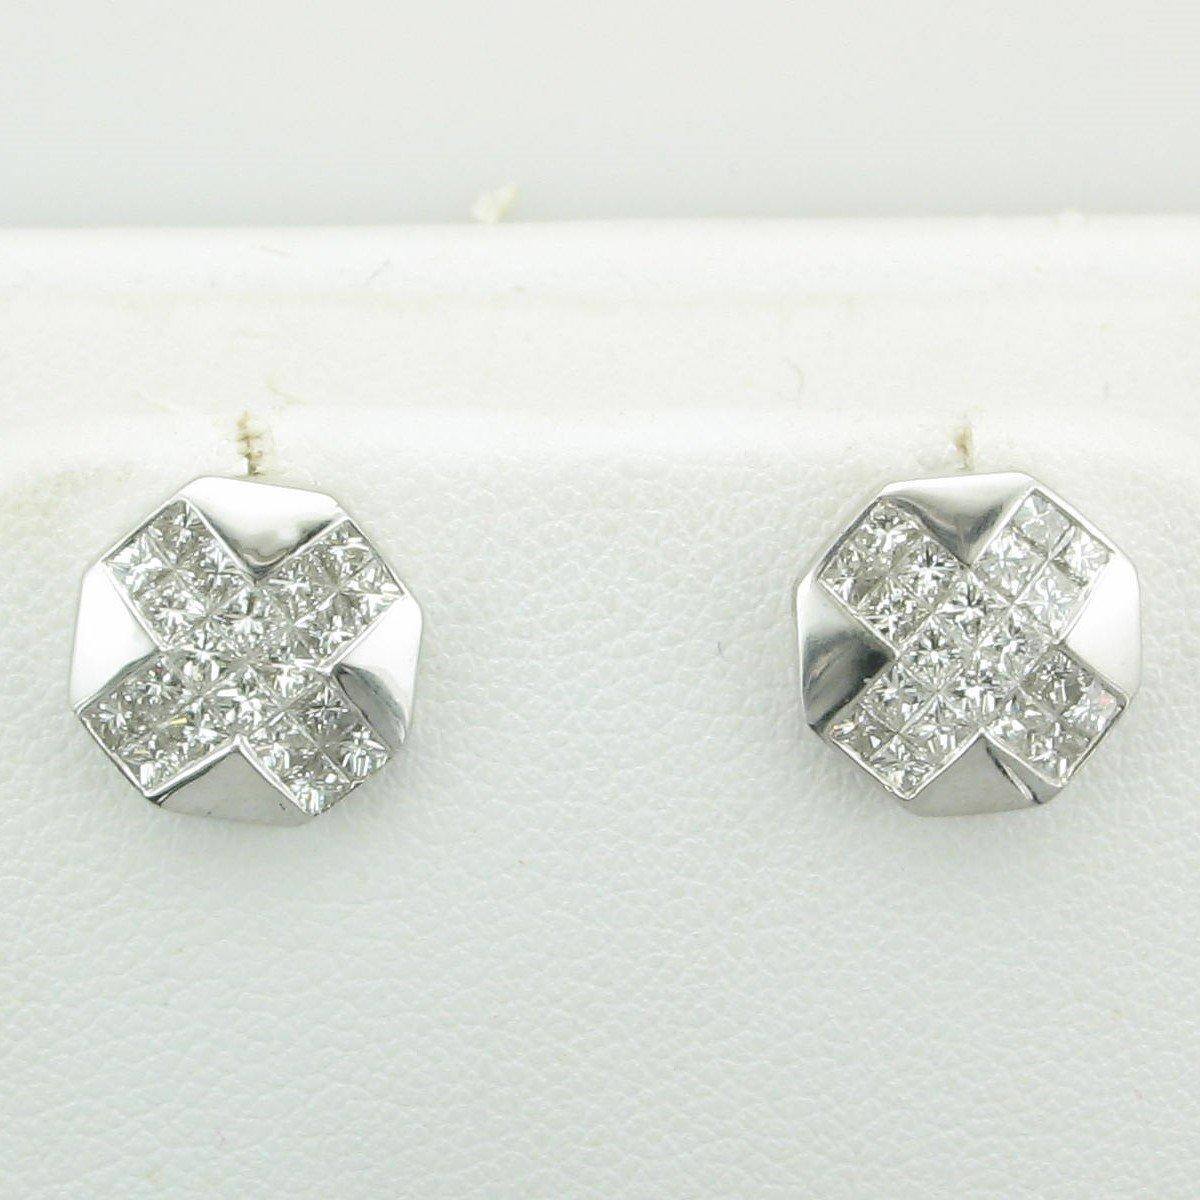 18K White Gold Octagon Diamond X Earrings